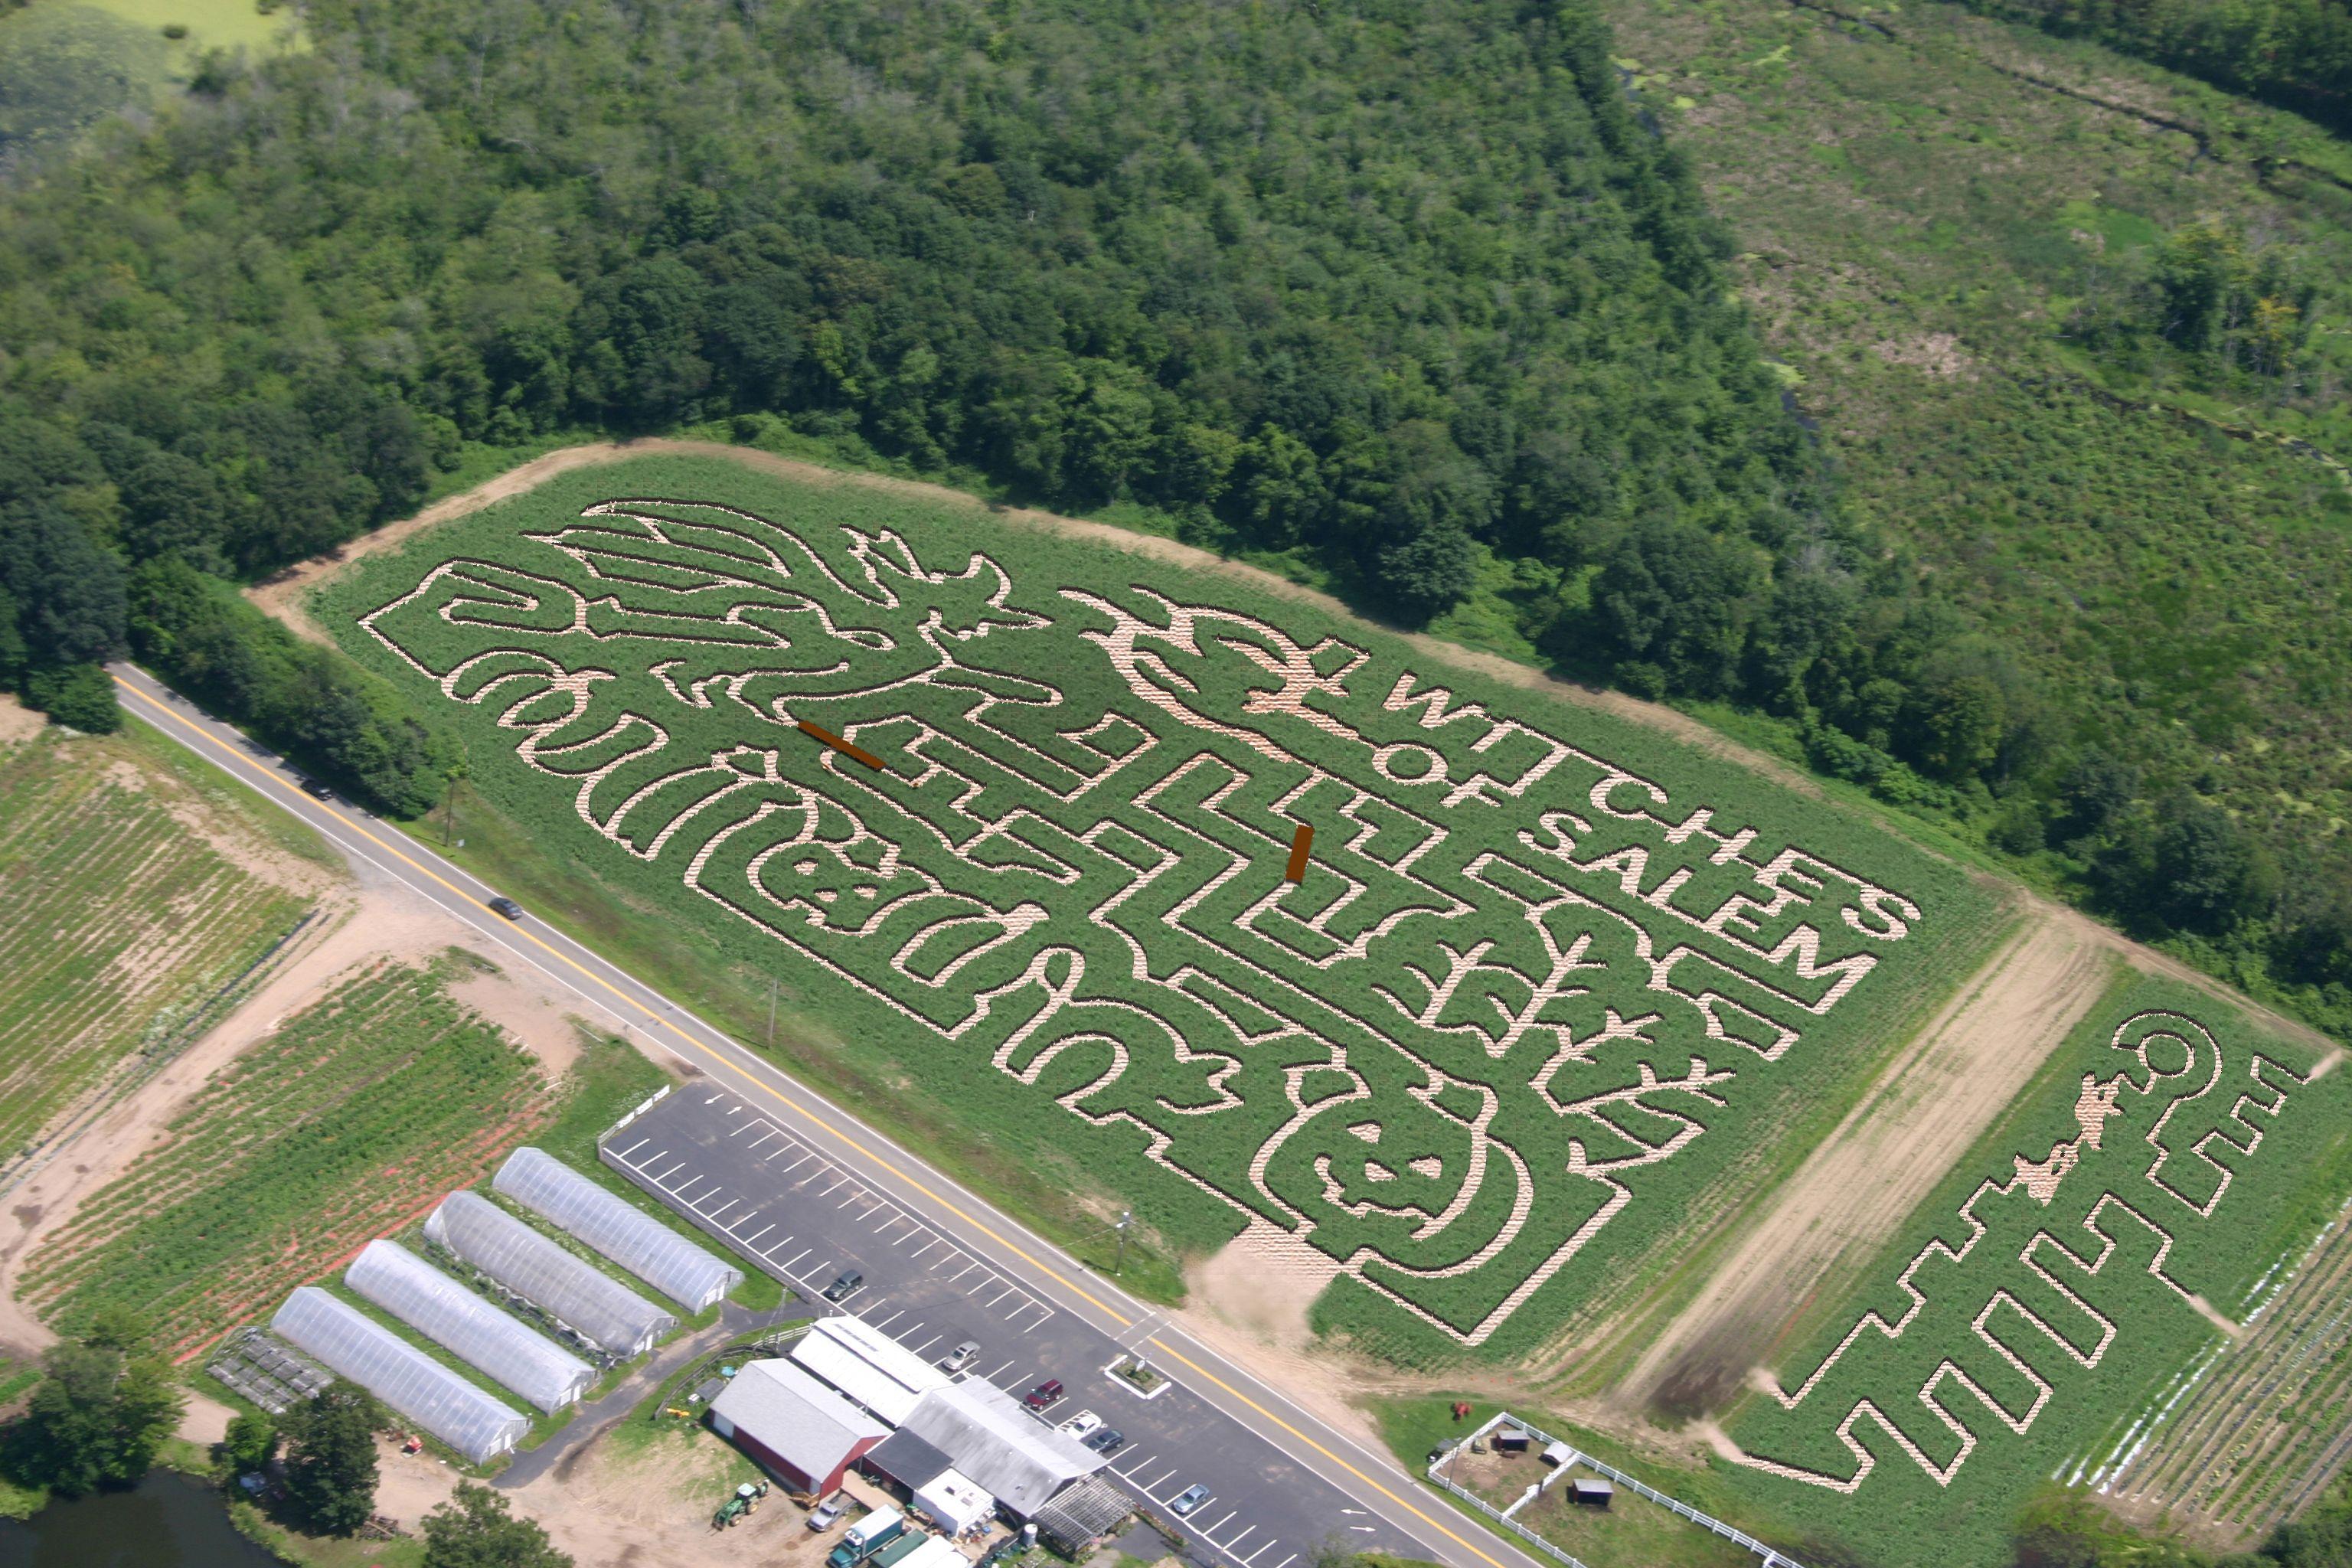 connors farm danvers ma corn maze salem massachusetts